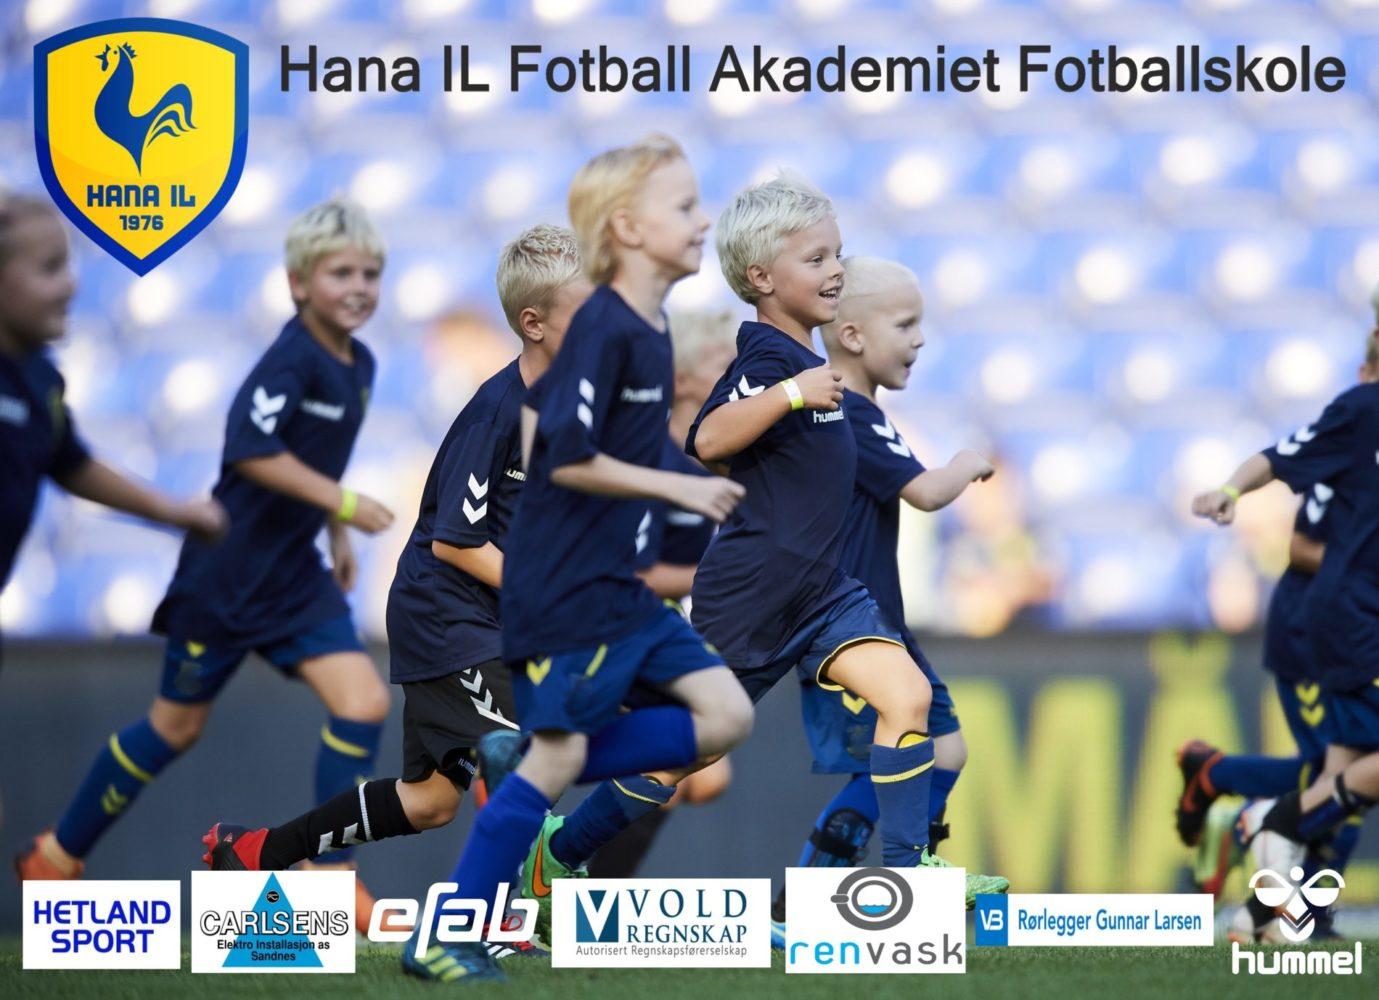 Hana IL Fotball Akademiet Fotballskole 2021